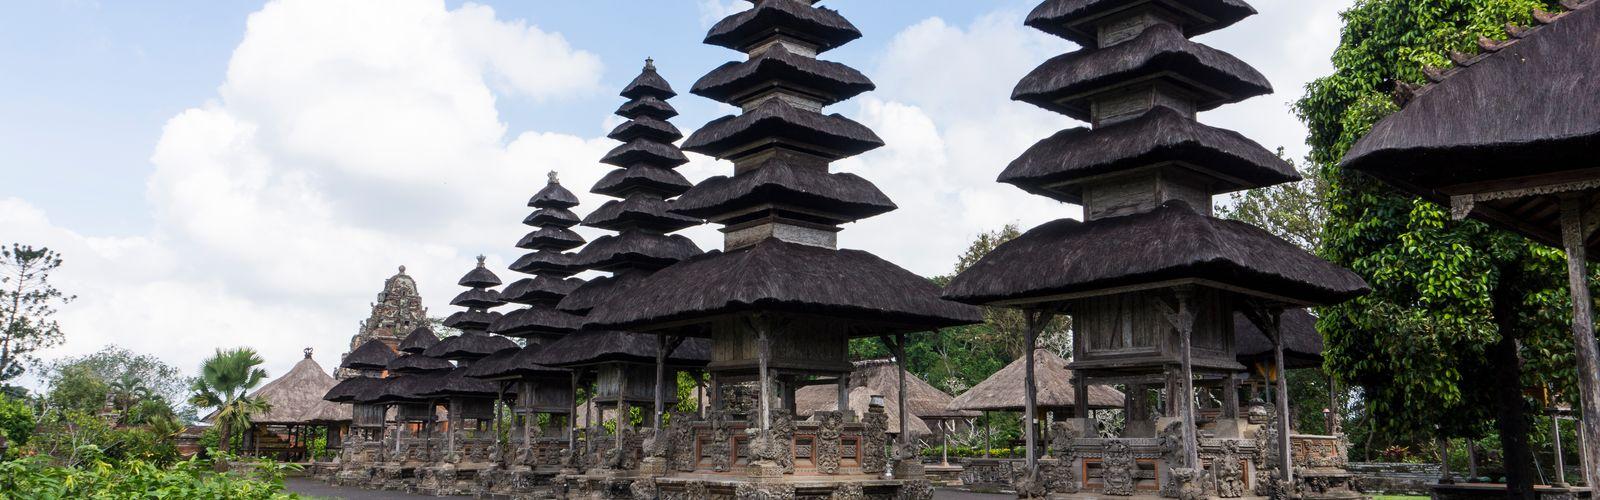 Bali FAM